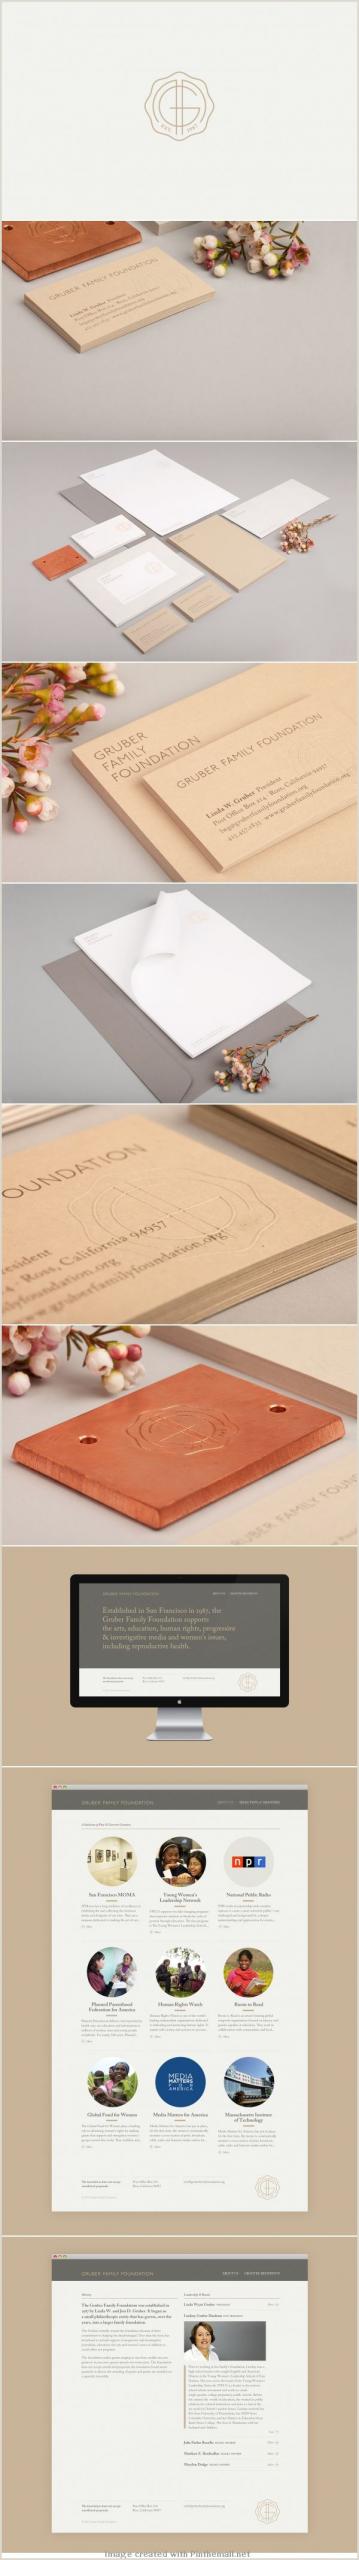 Design My Own Business Cards 14 Popular Hardwood Flooring Business Card Template